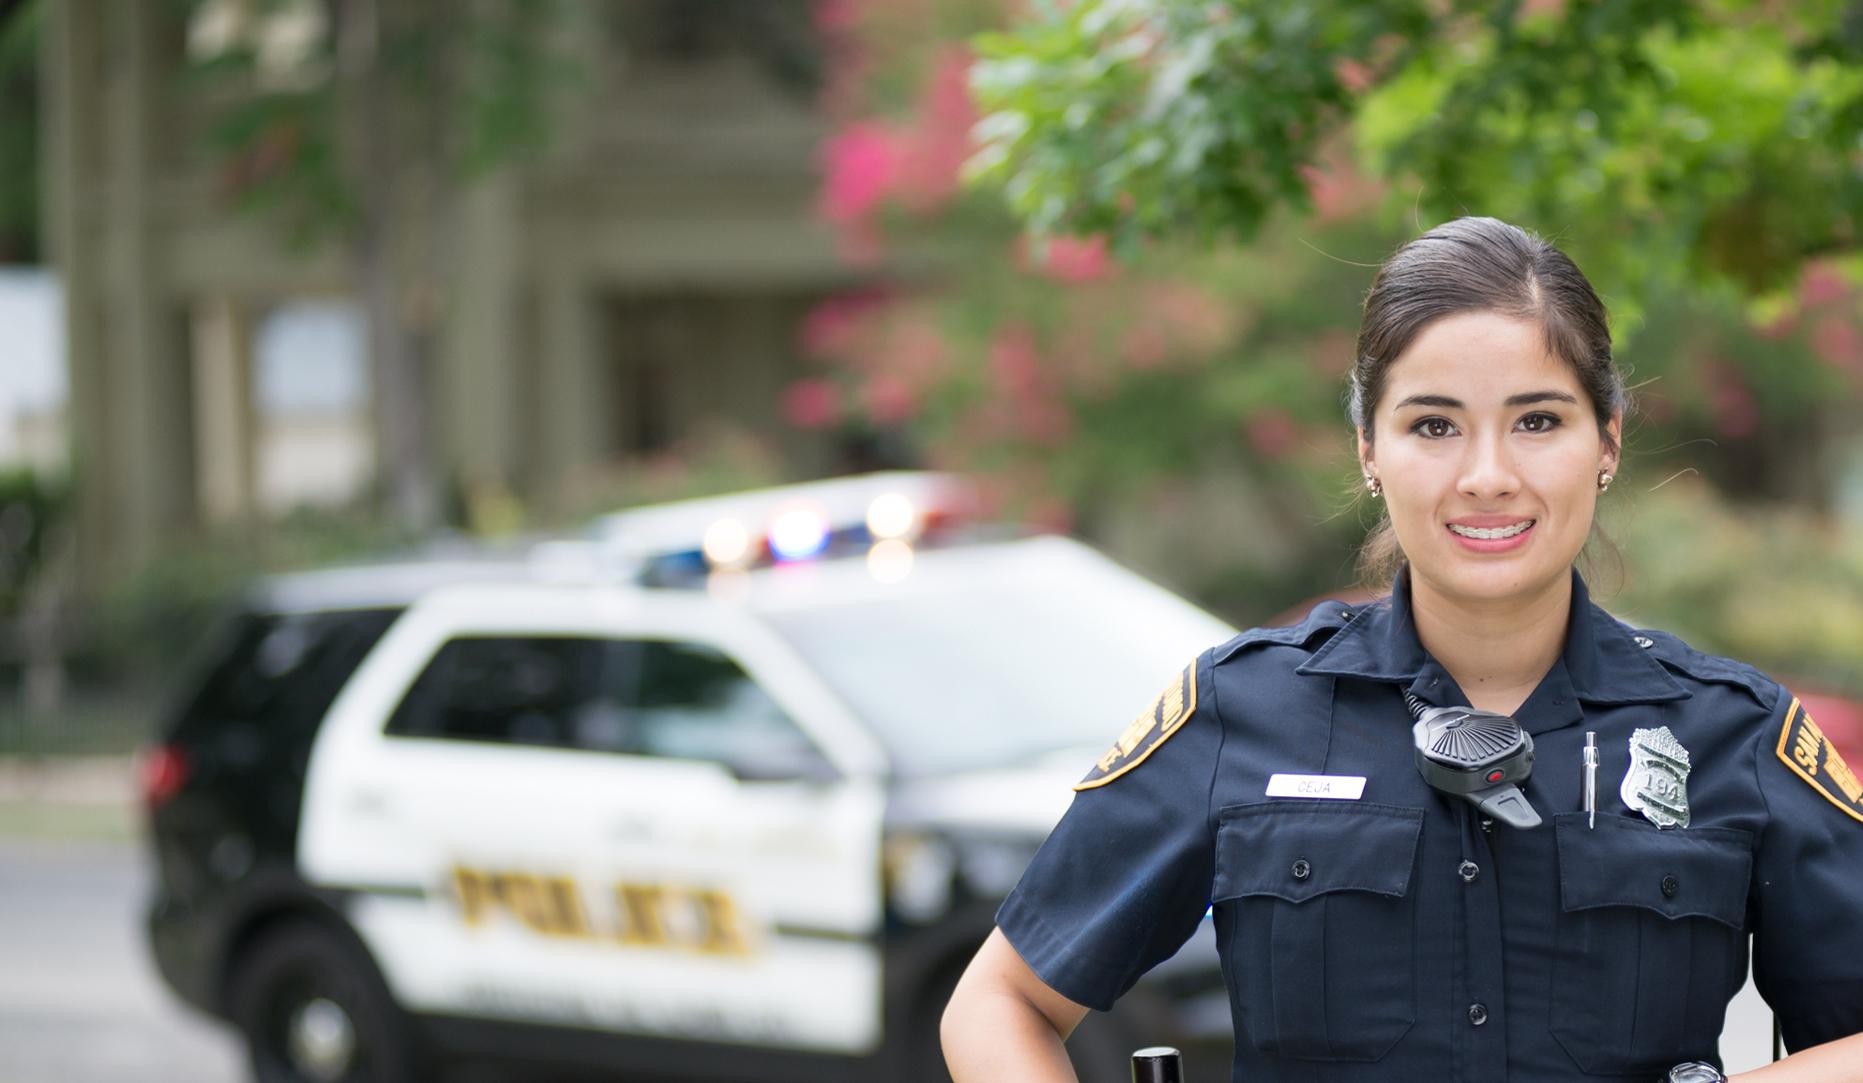 San Antonio Police use the NCJOSI as the basis for their written exam known as SALEE.